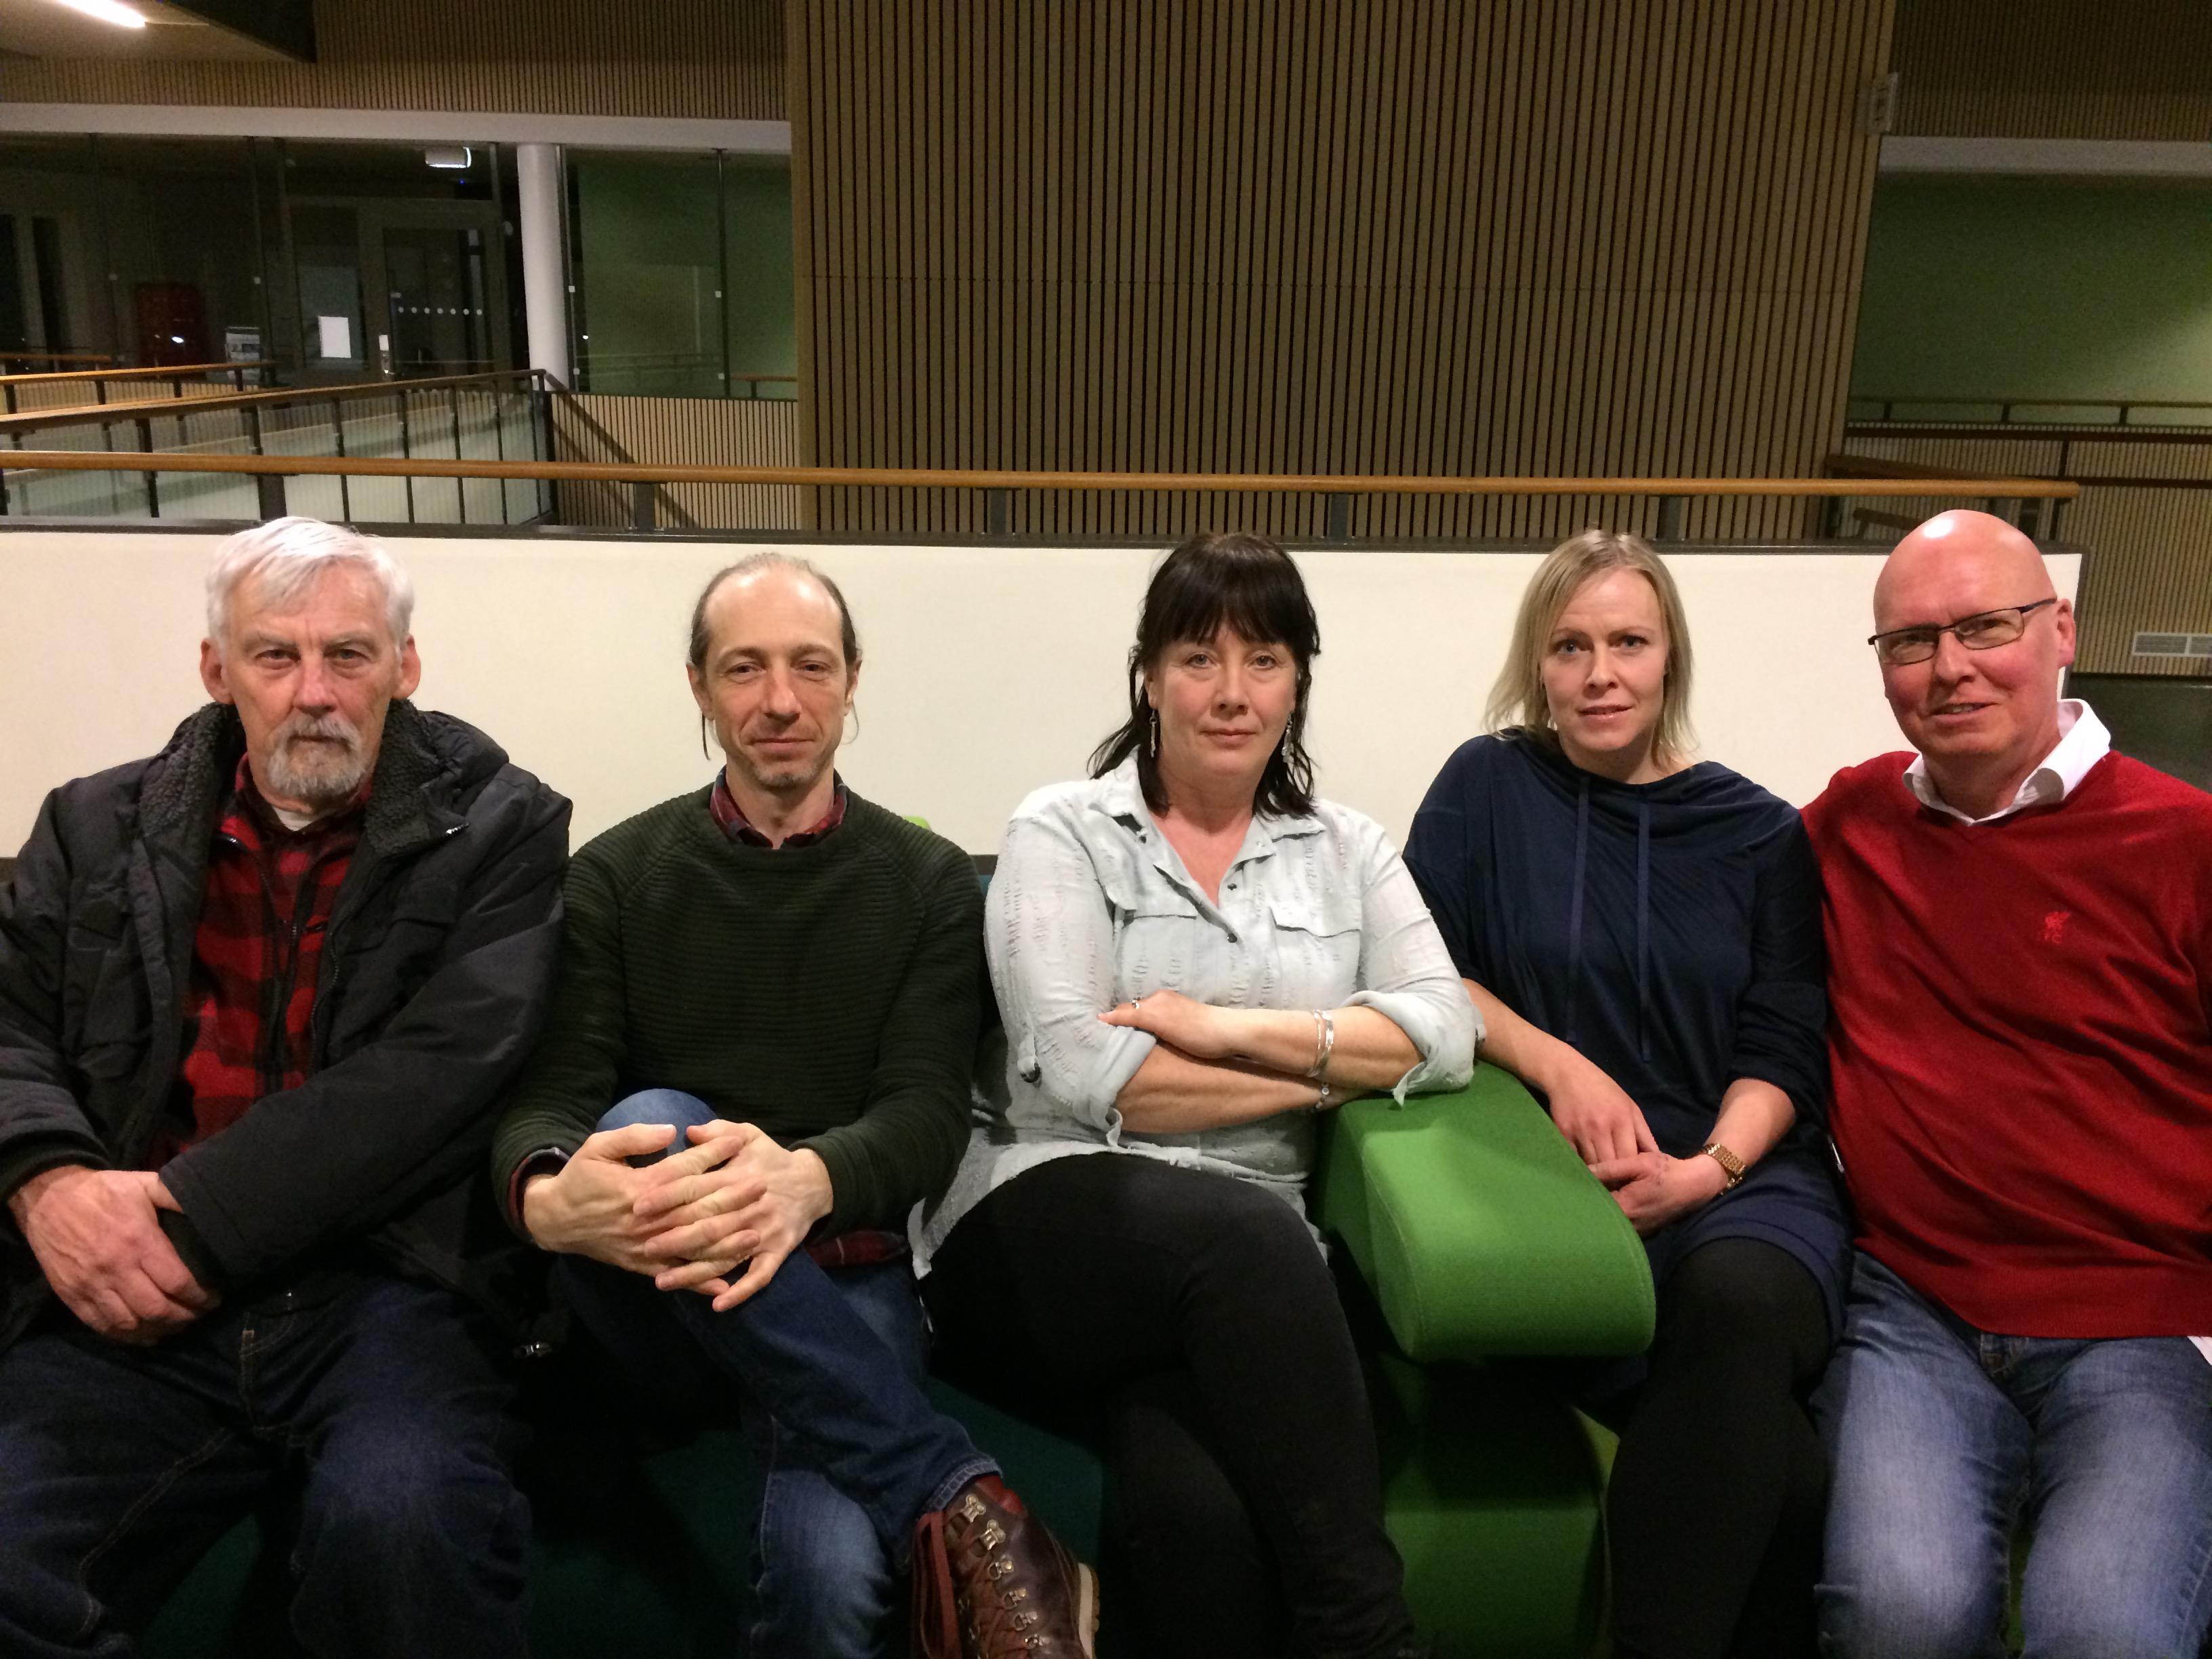 Tommy, Fredrik, Maria, Anna och Christer